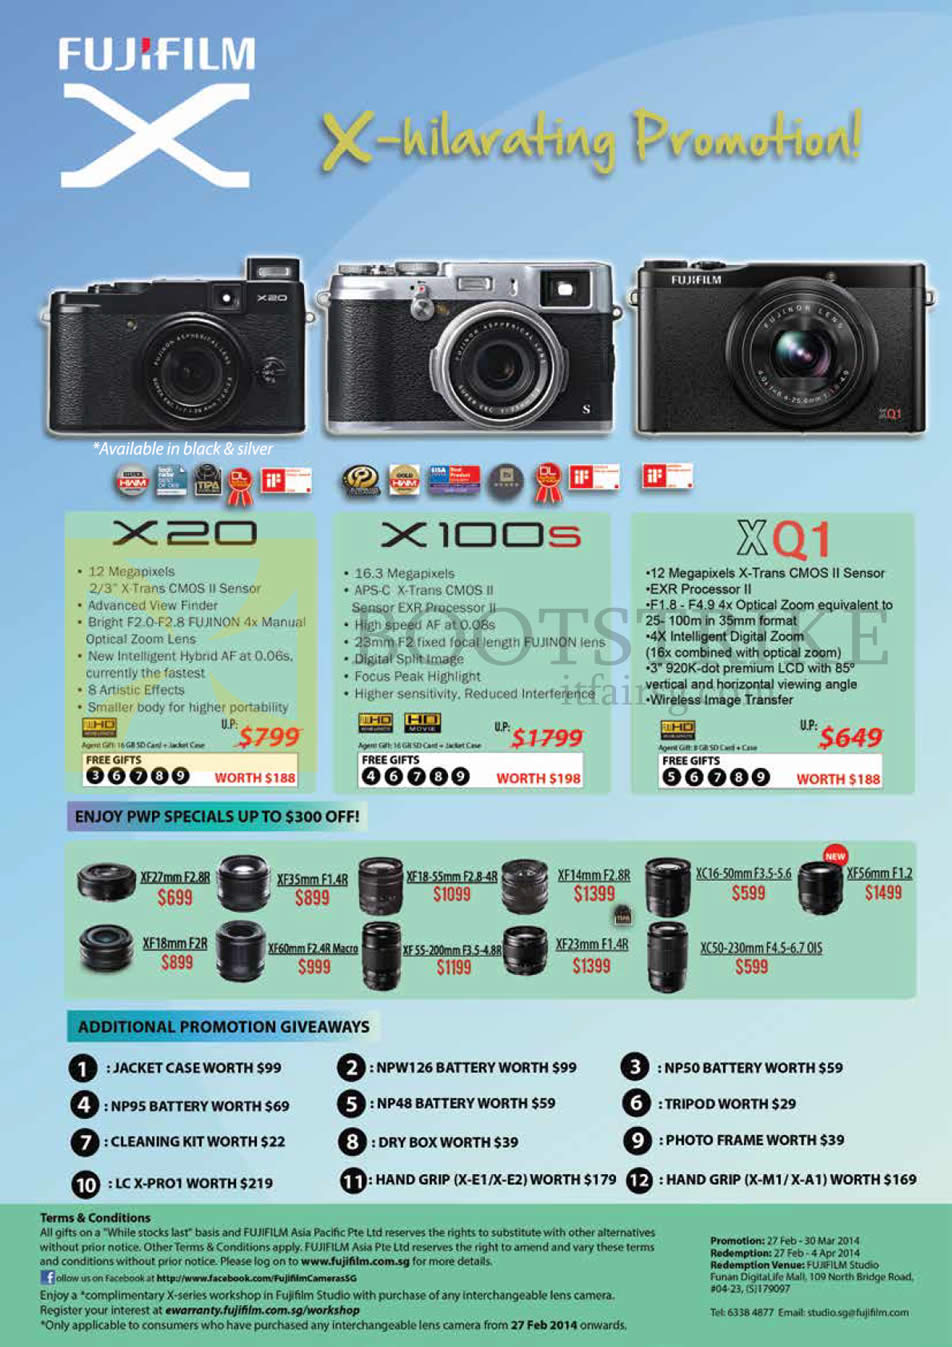 Jual Murah Fujifilm X E3 Kit Xf18 55mm F 28 4 R Lm Ois Black Pwp Xf Emoney E Money Etol Tol Etoll Toll Flazz Bca Card Kartu Anime Fanart Kartun Doraemon Dora04 Camera Deal In Town Prices Singapore